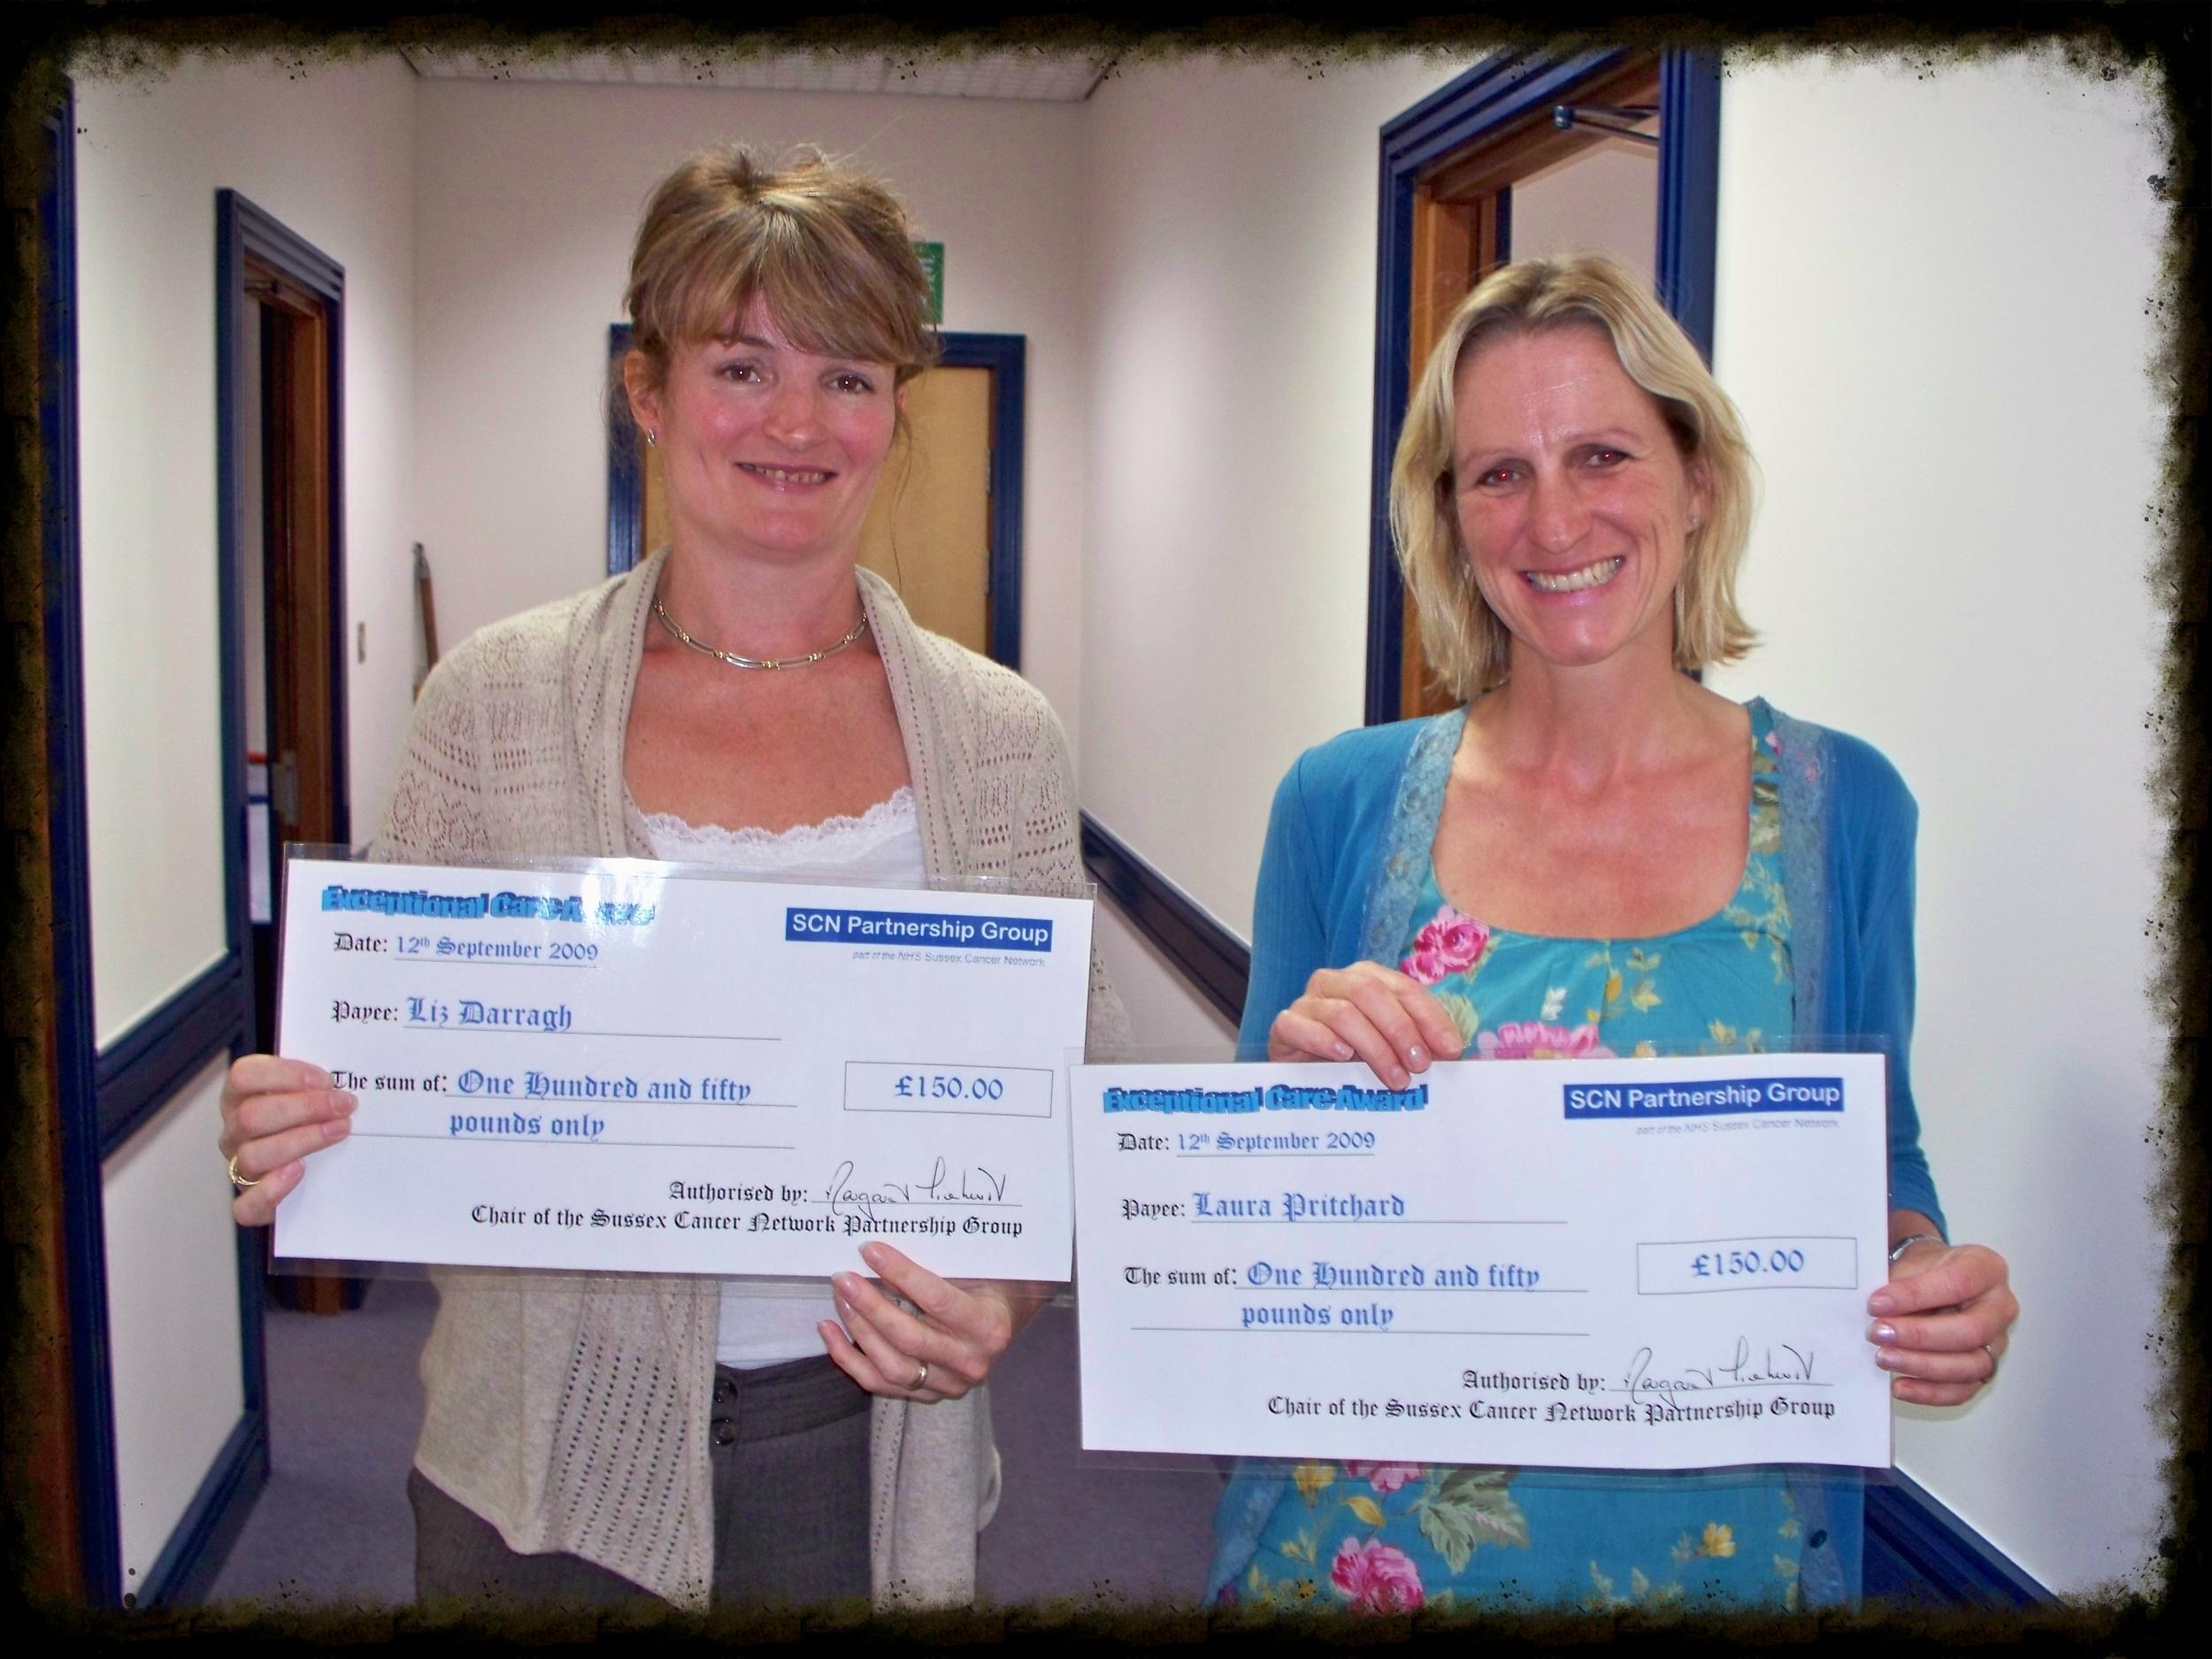 Exceptional Care Award Winners: Liz & Laura